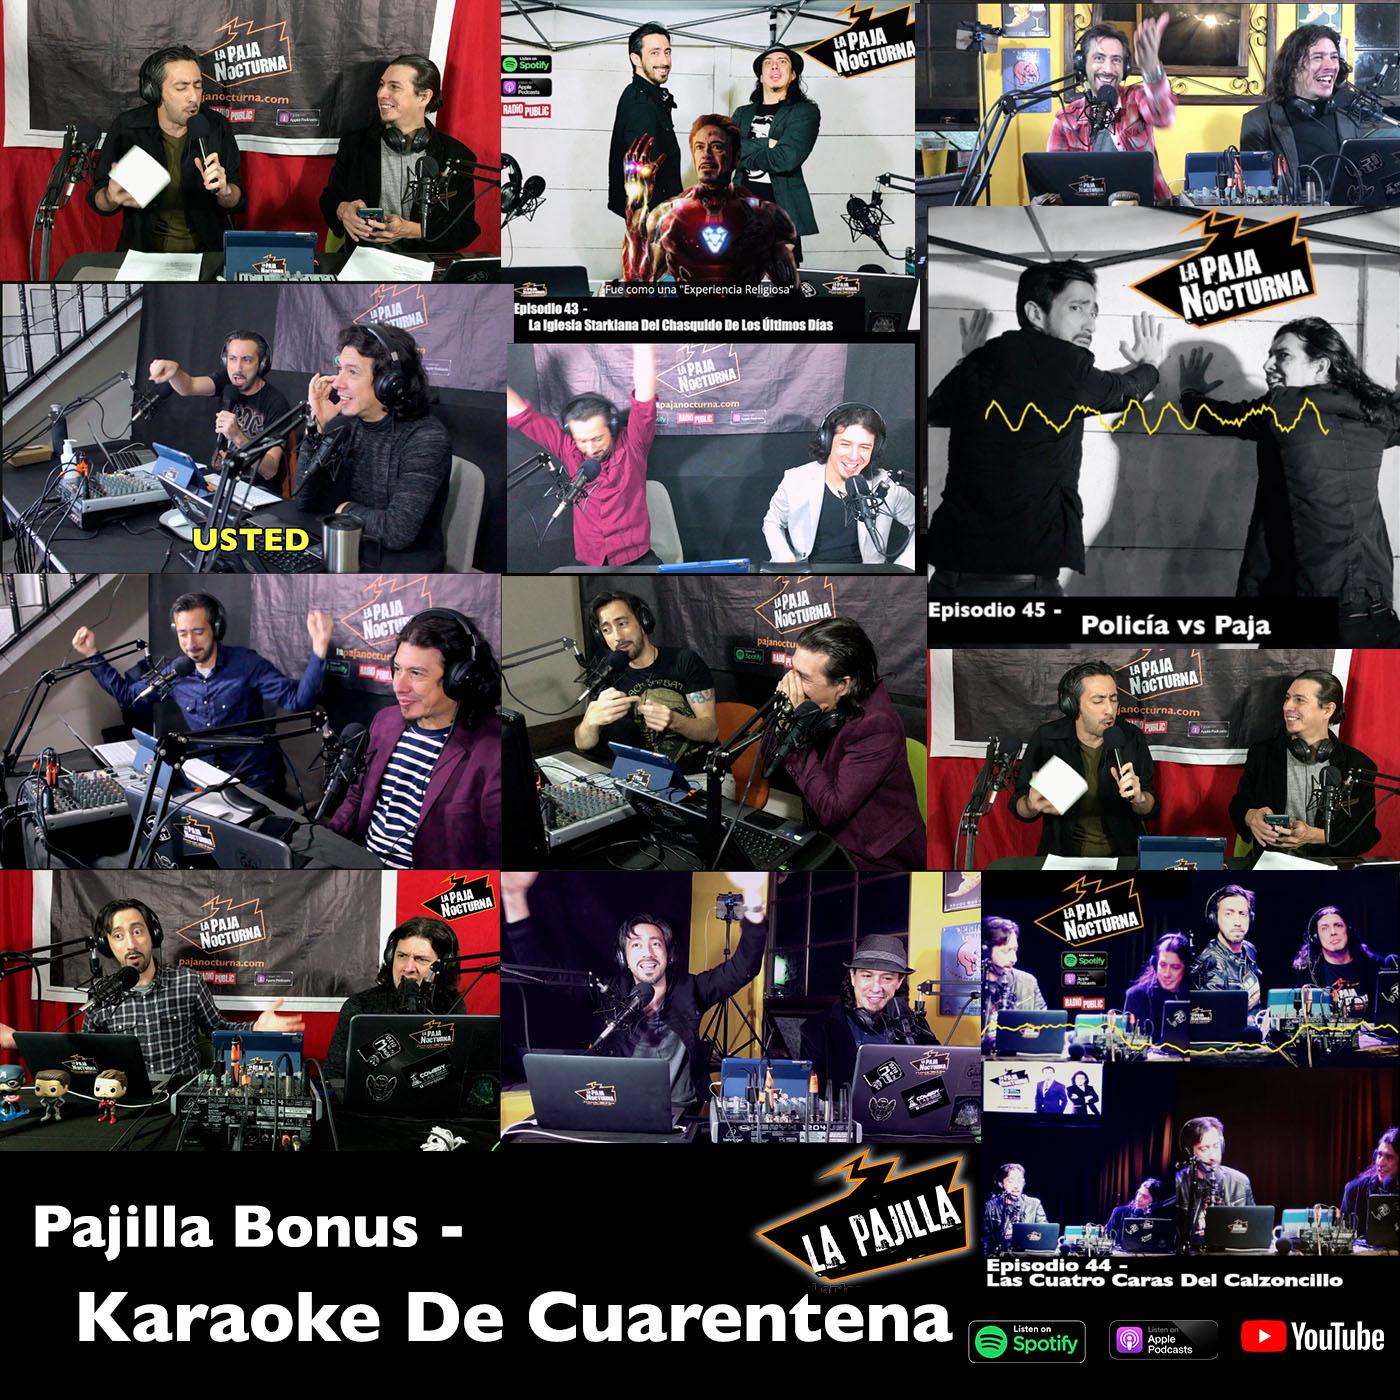 La Paja Nocturna Podcast CR Pajilla Bonus